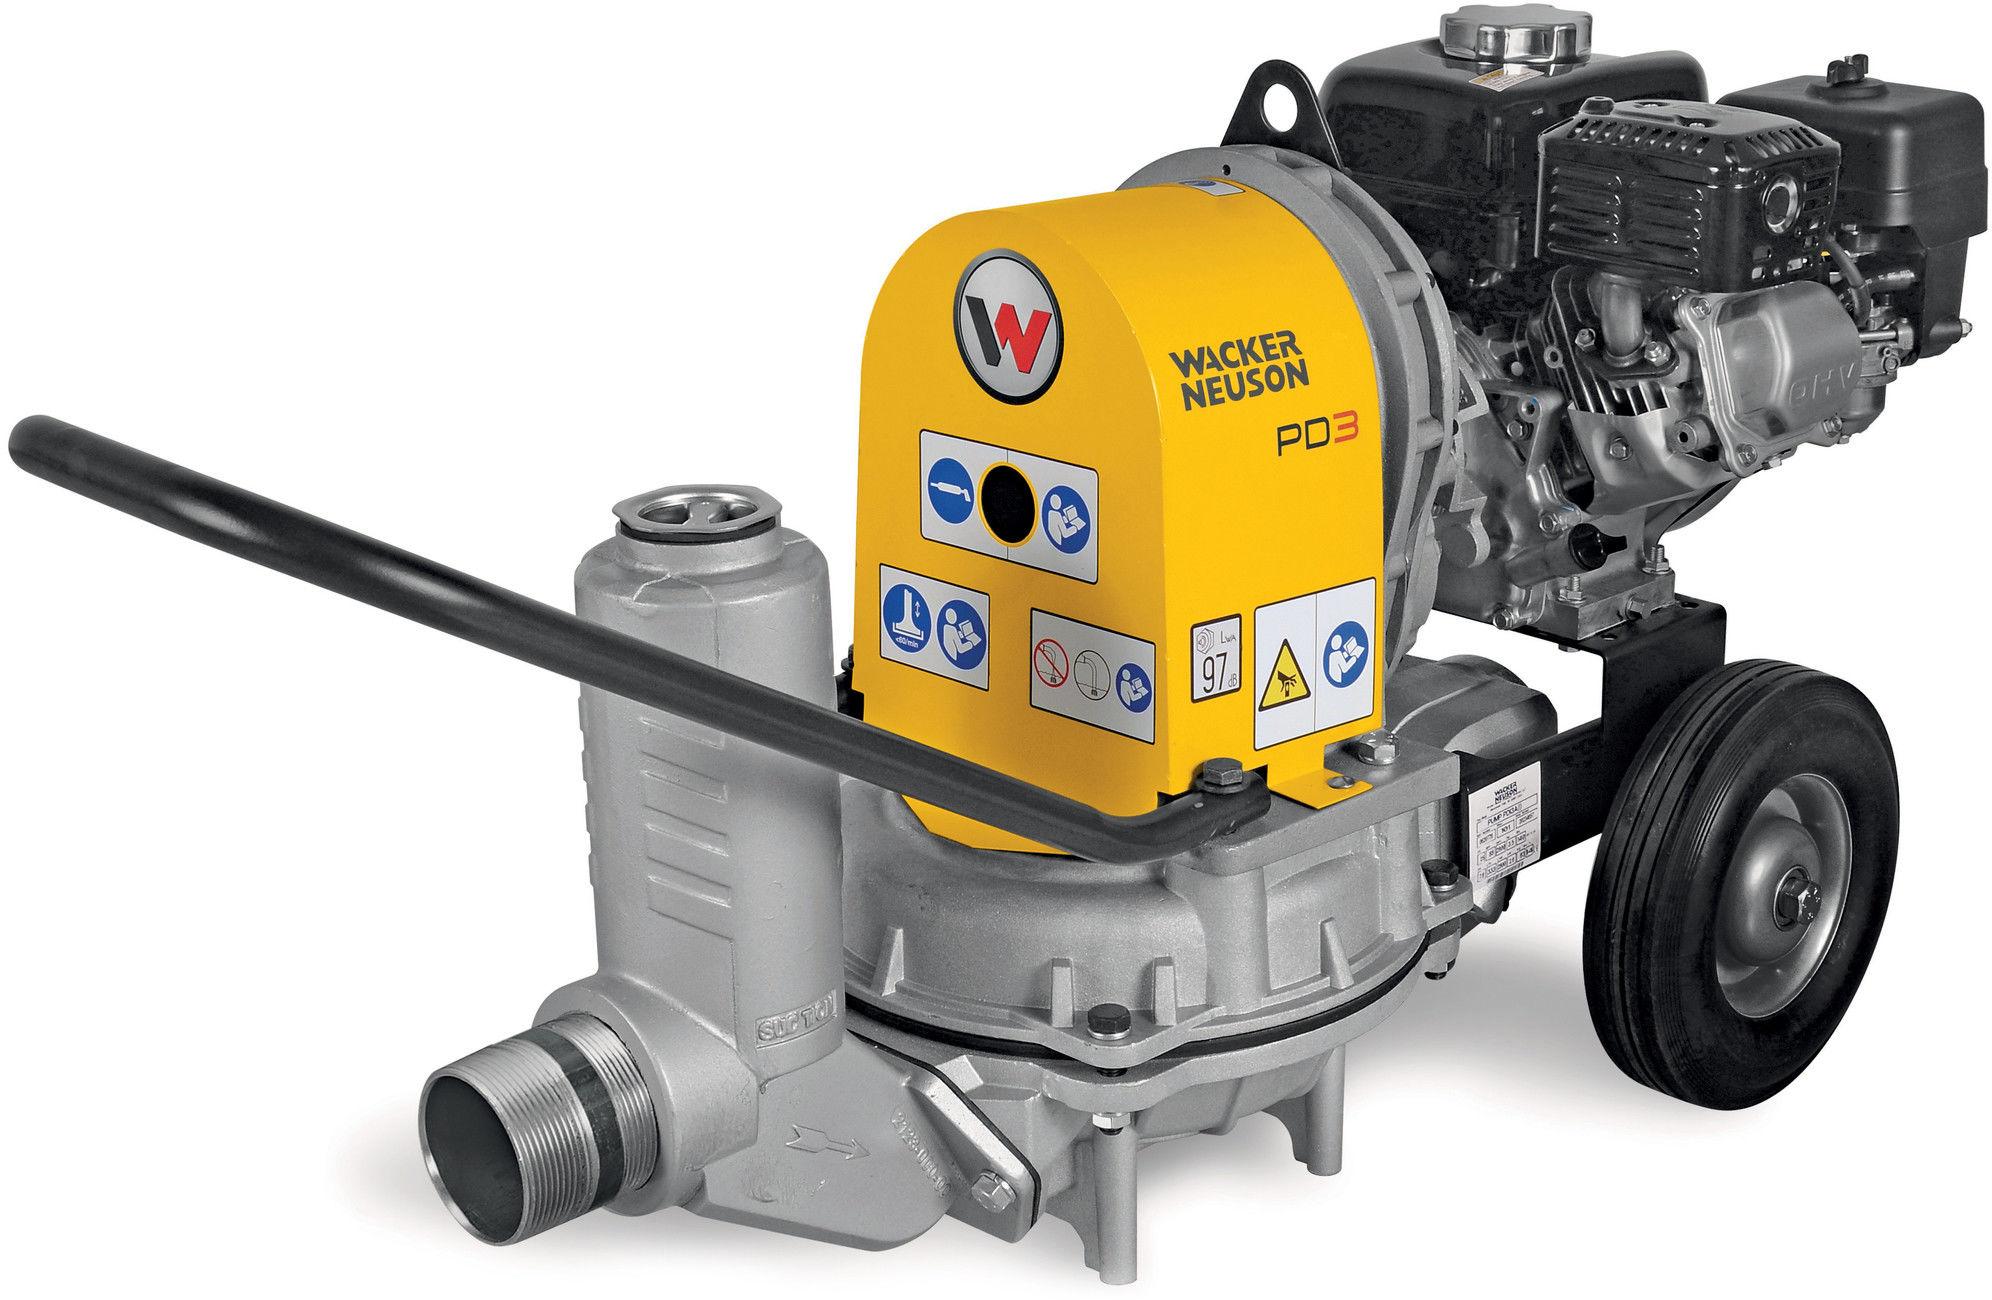 Motopompa do brudnej wody Wacker Neuson PDI 3A